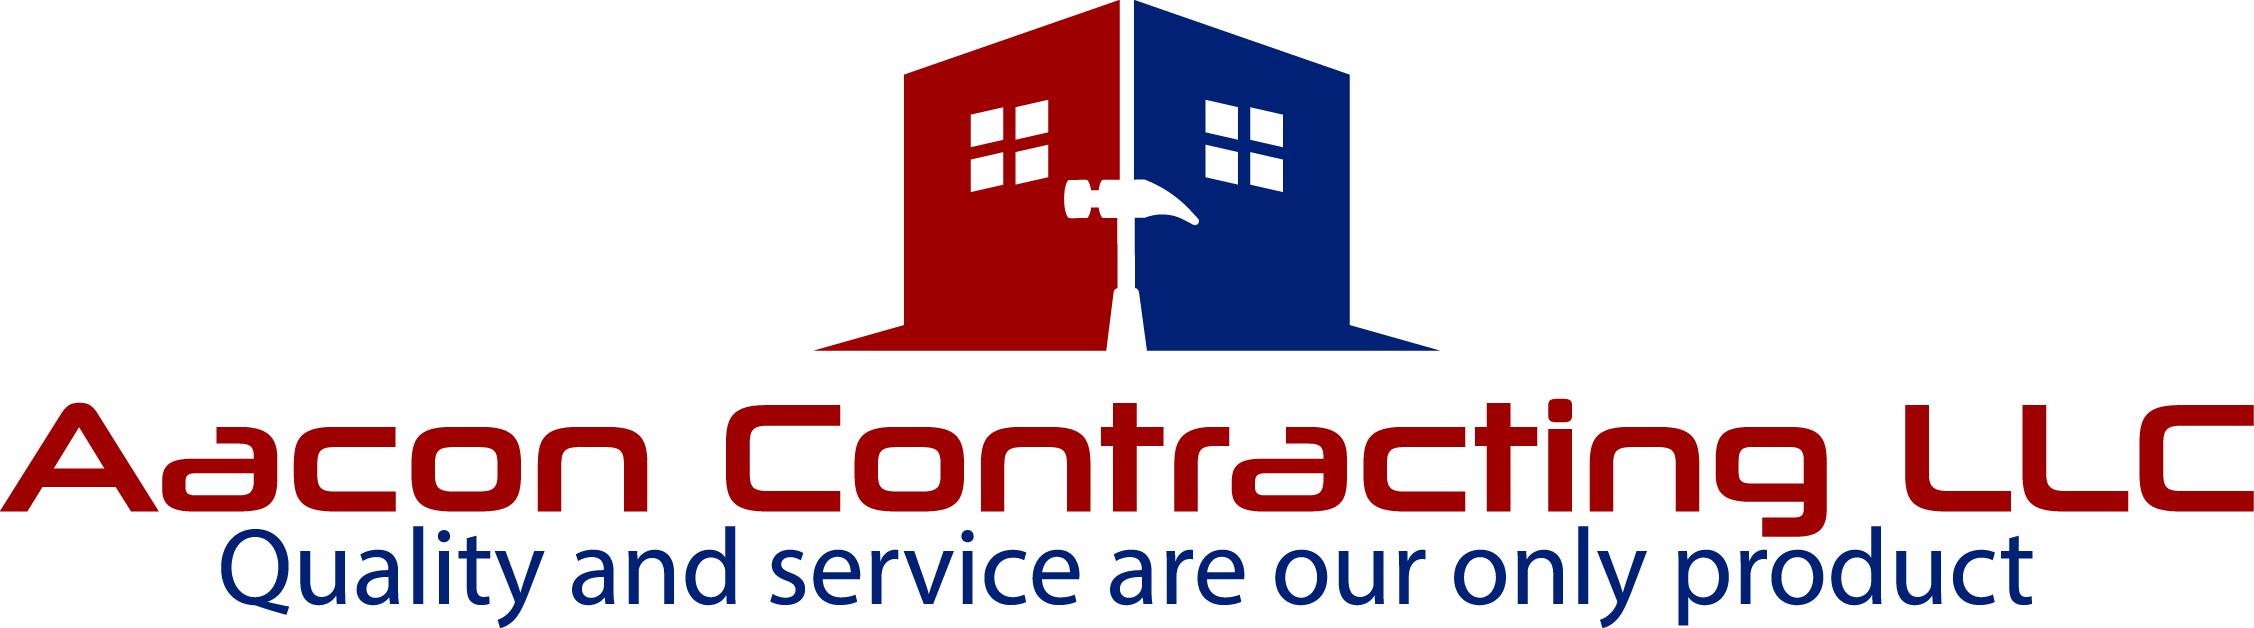 Aacon_Contracting_3.jpg